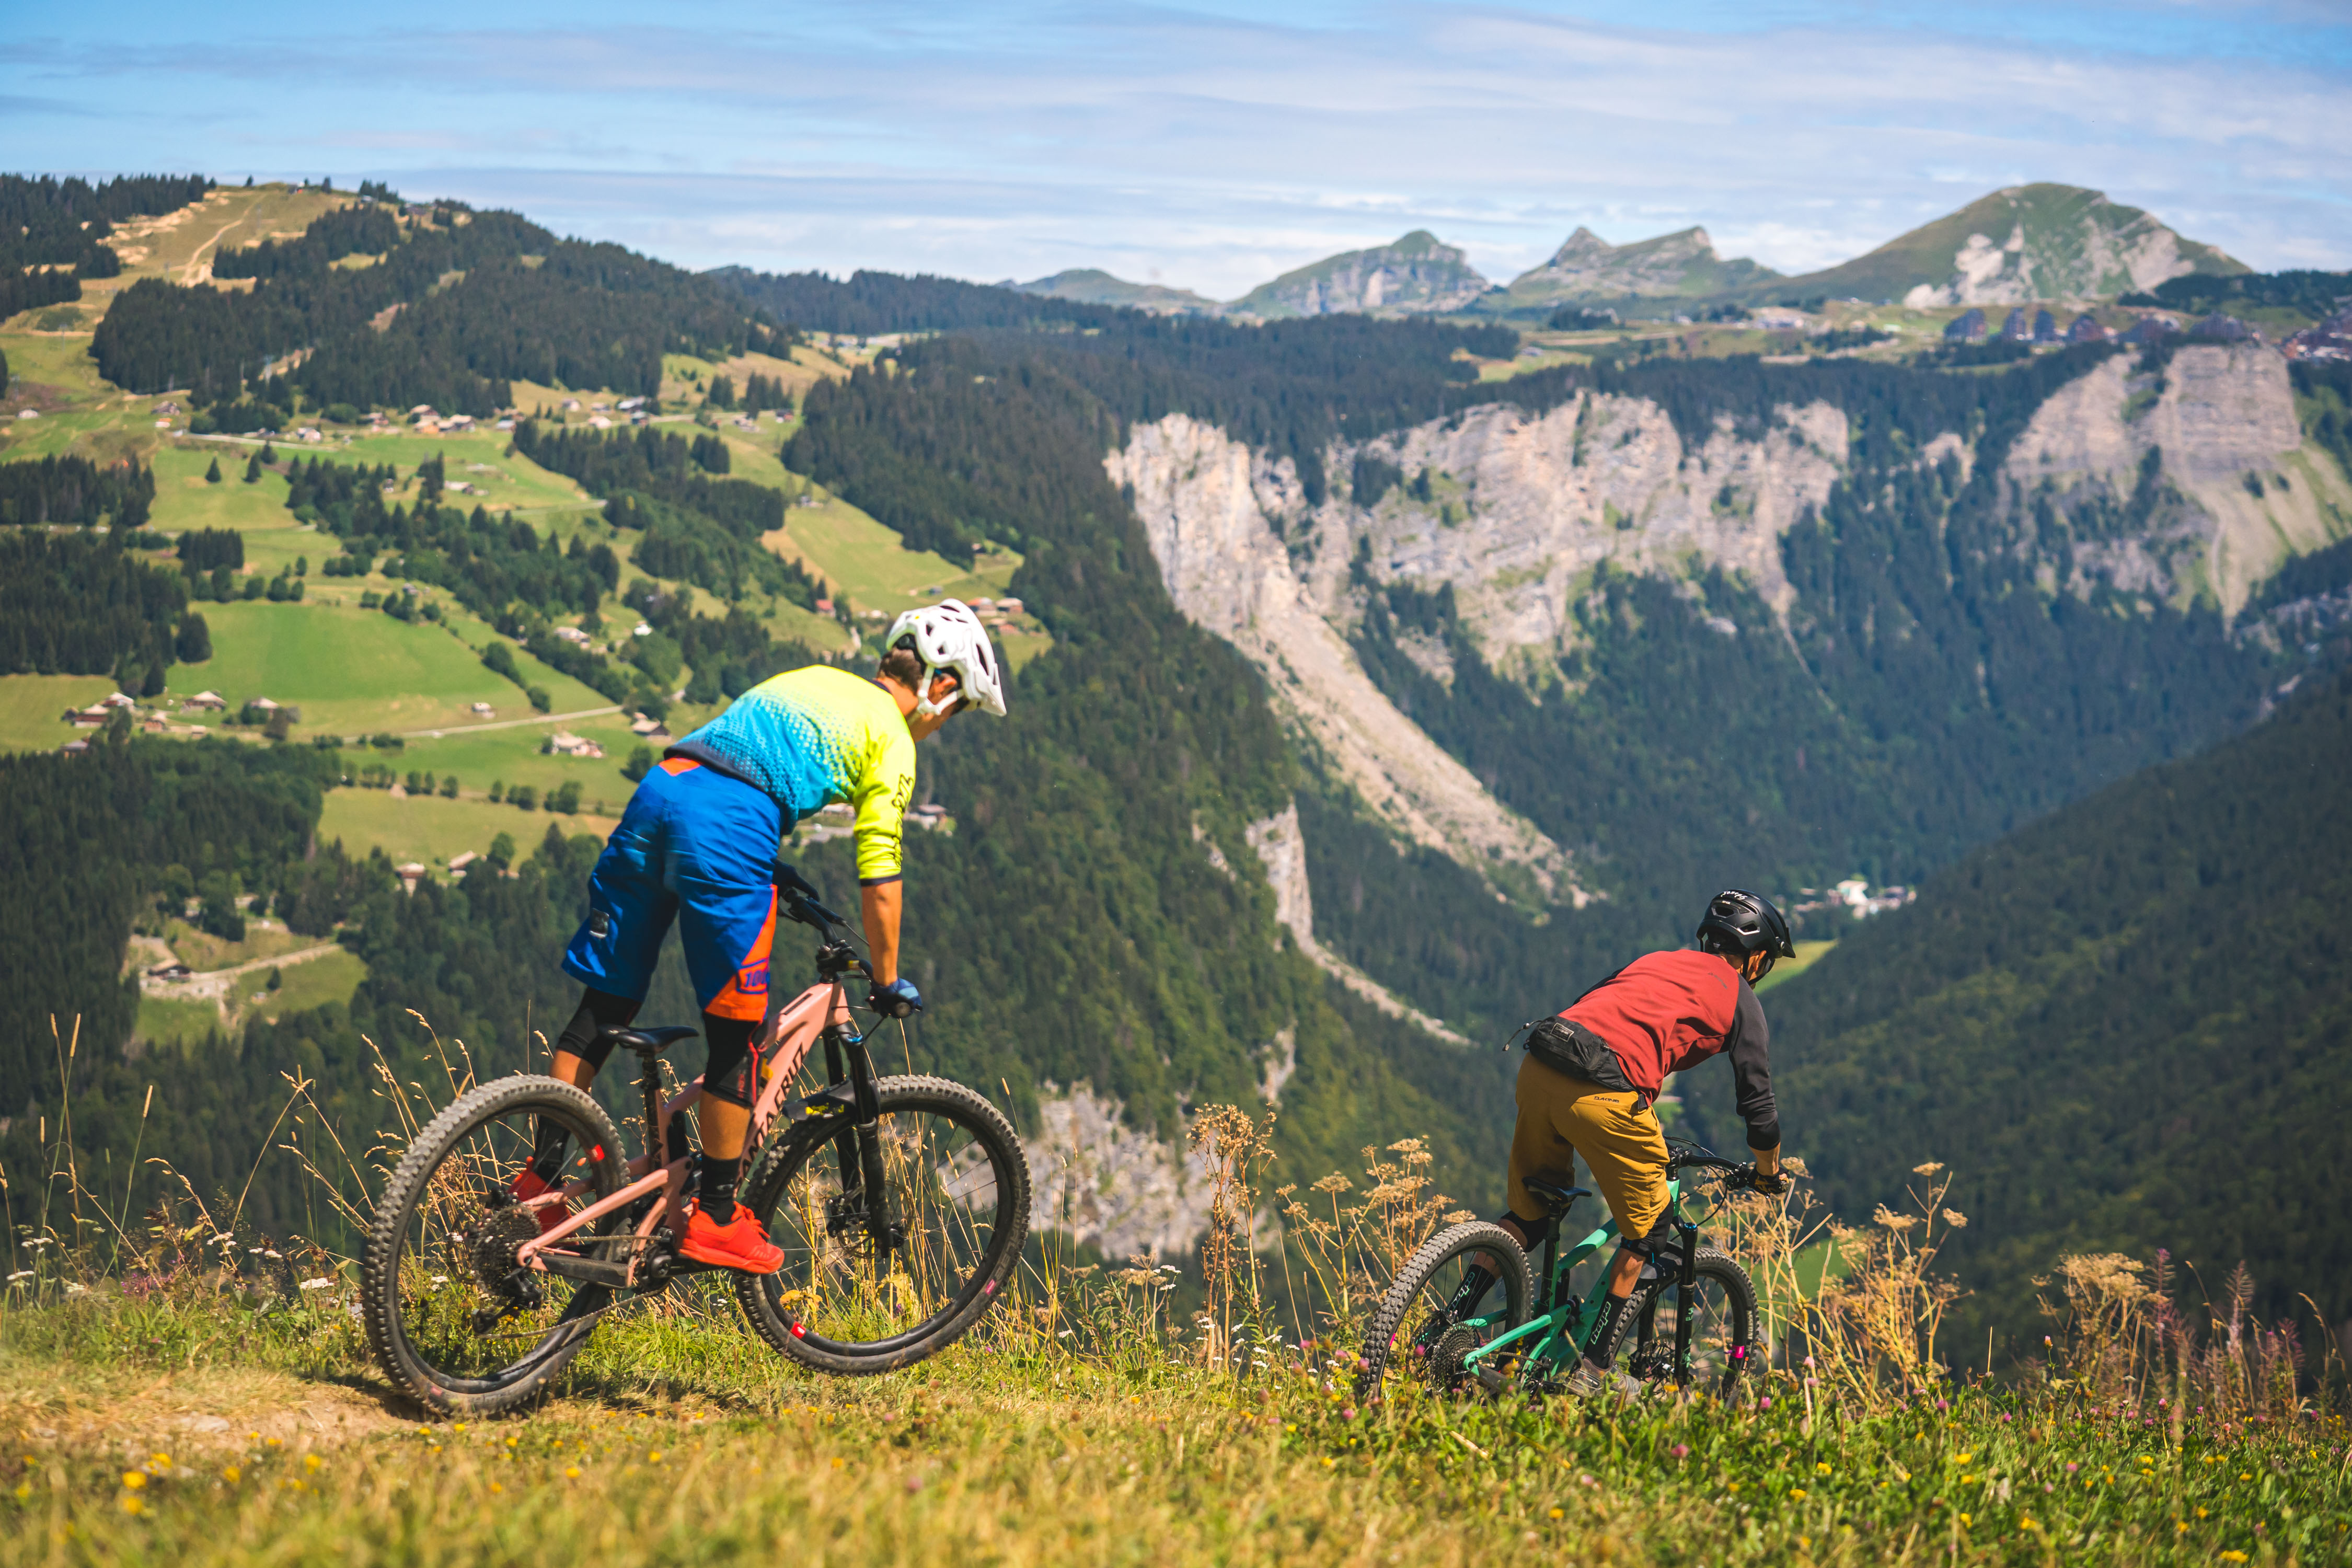 How to prepare your mountain bike trip when you are a beginner - © Keno Derleyn